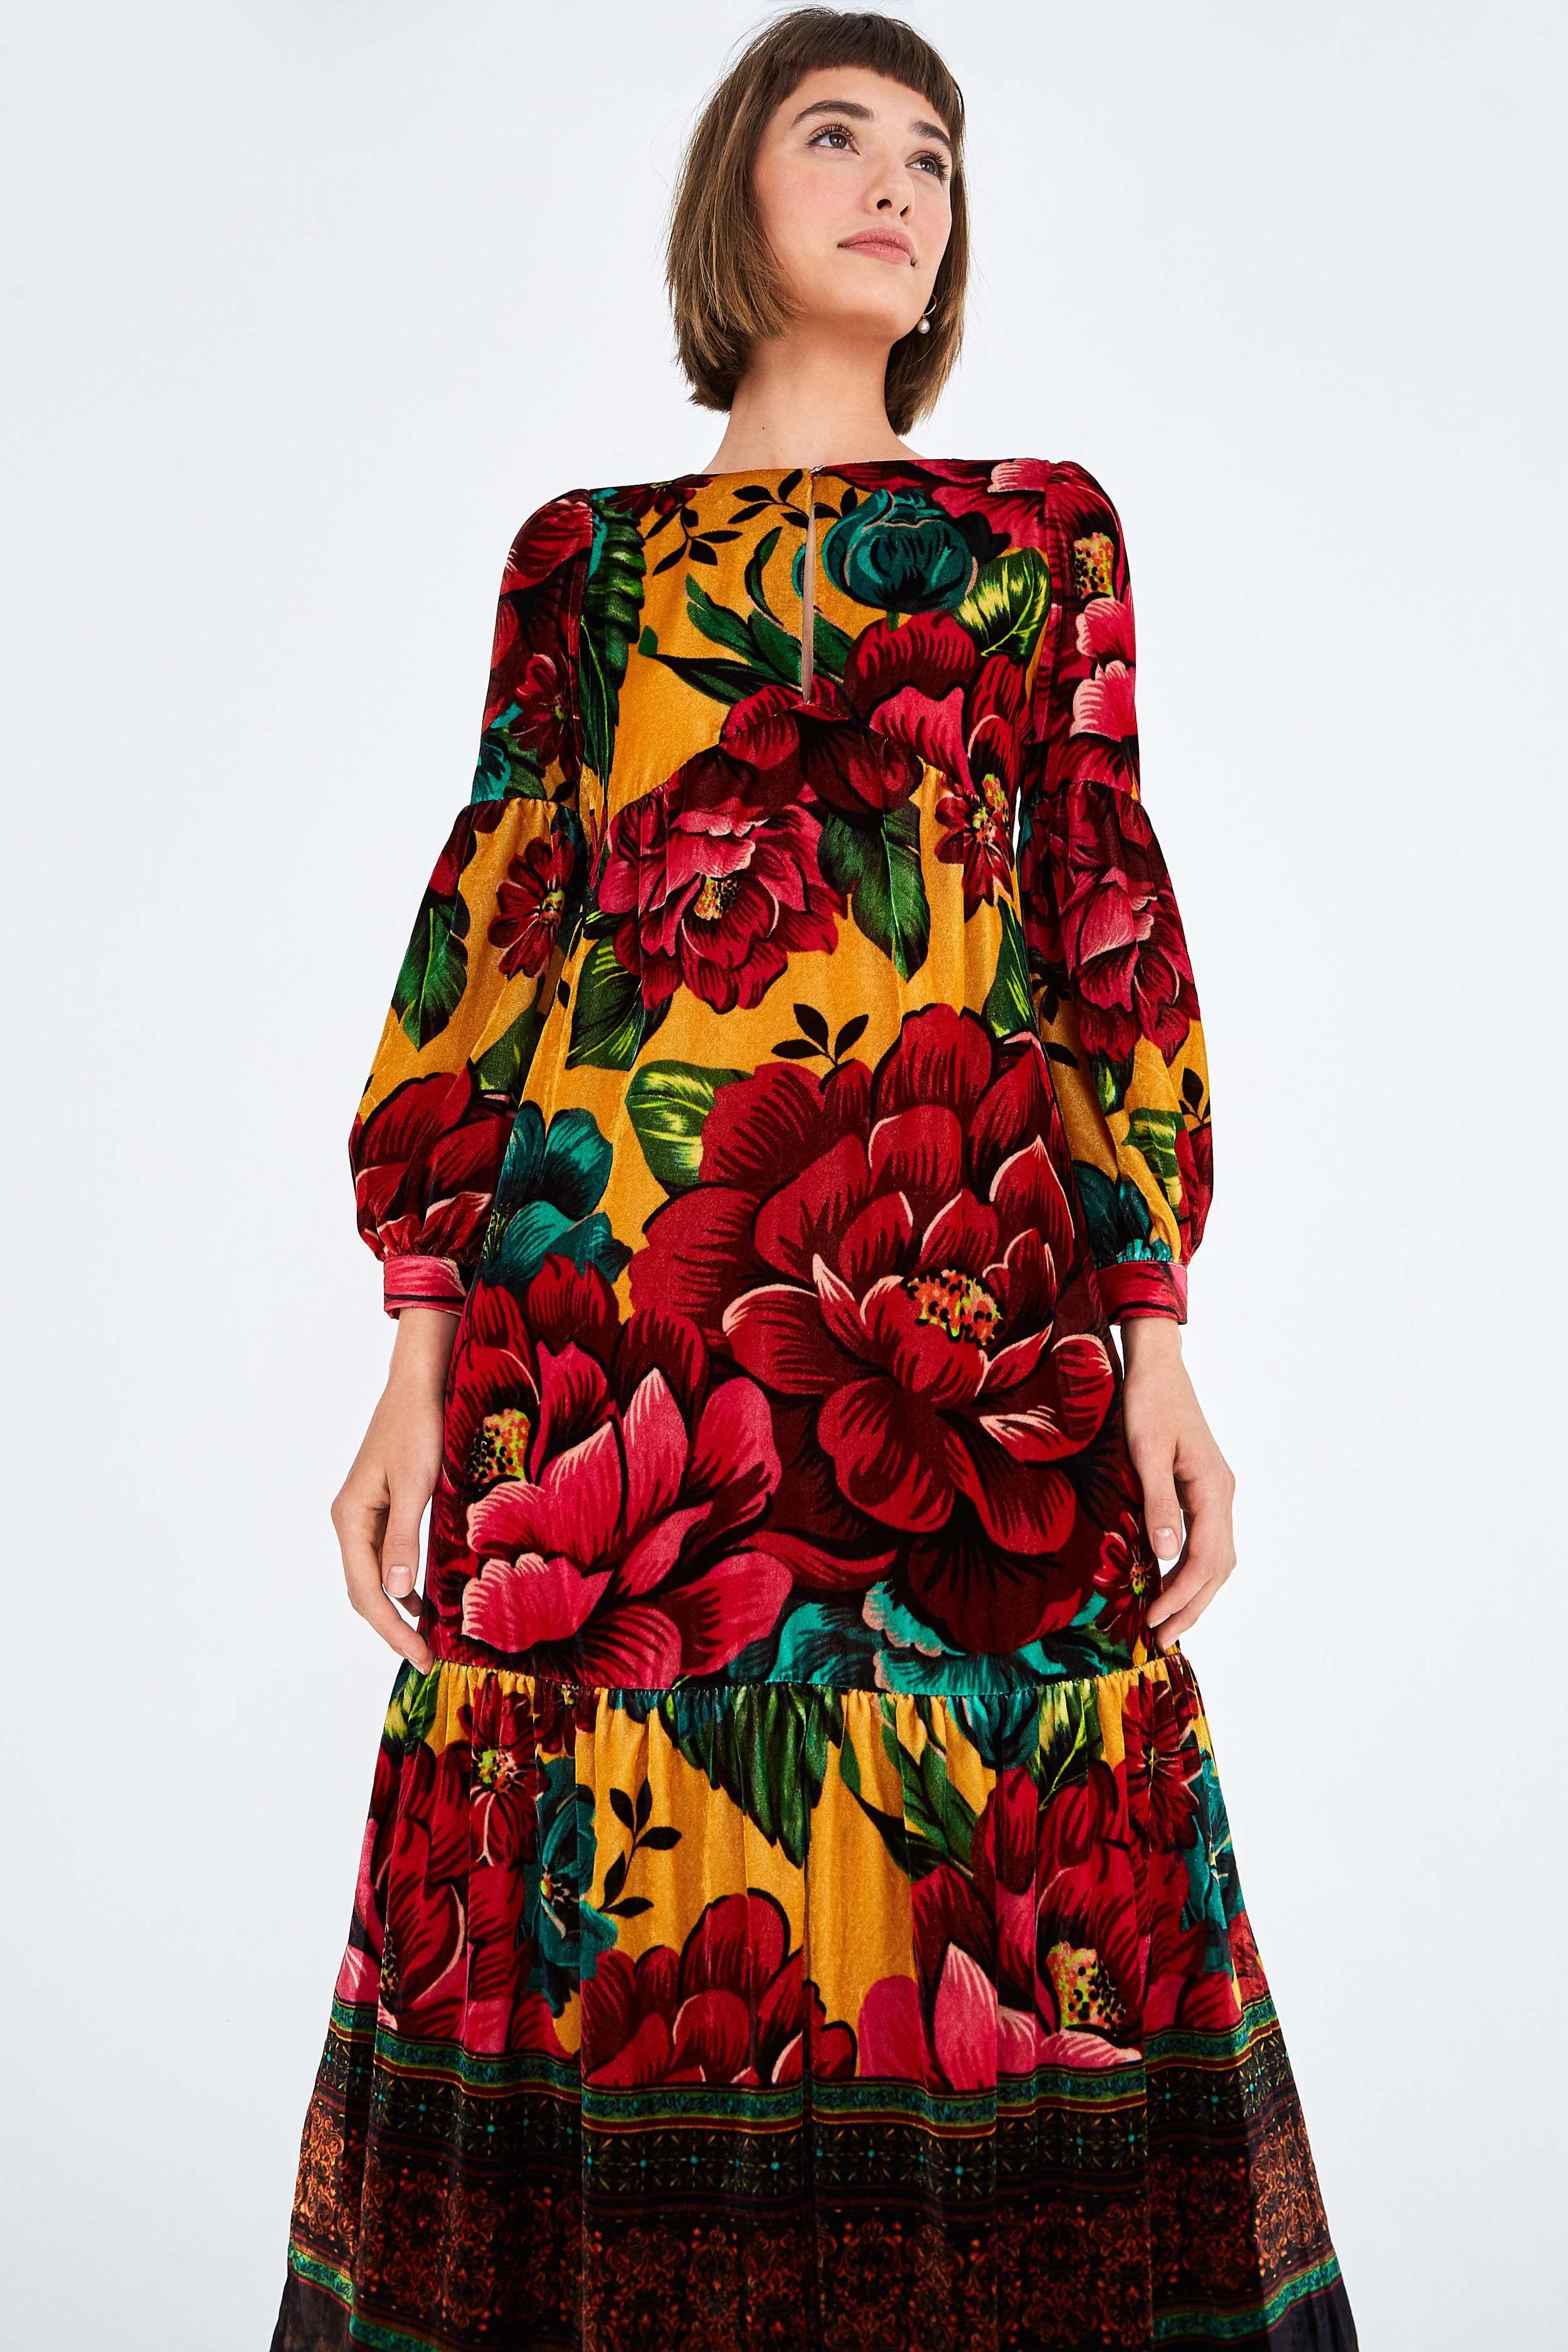 Farm Rio Winter Garden Velvet Maxi Multi M In 2020 Maxi Dress Leopard Maxi Dress Sleeveless Maxi Dress [ 3750 x 2500 Pixel ]